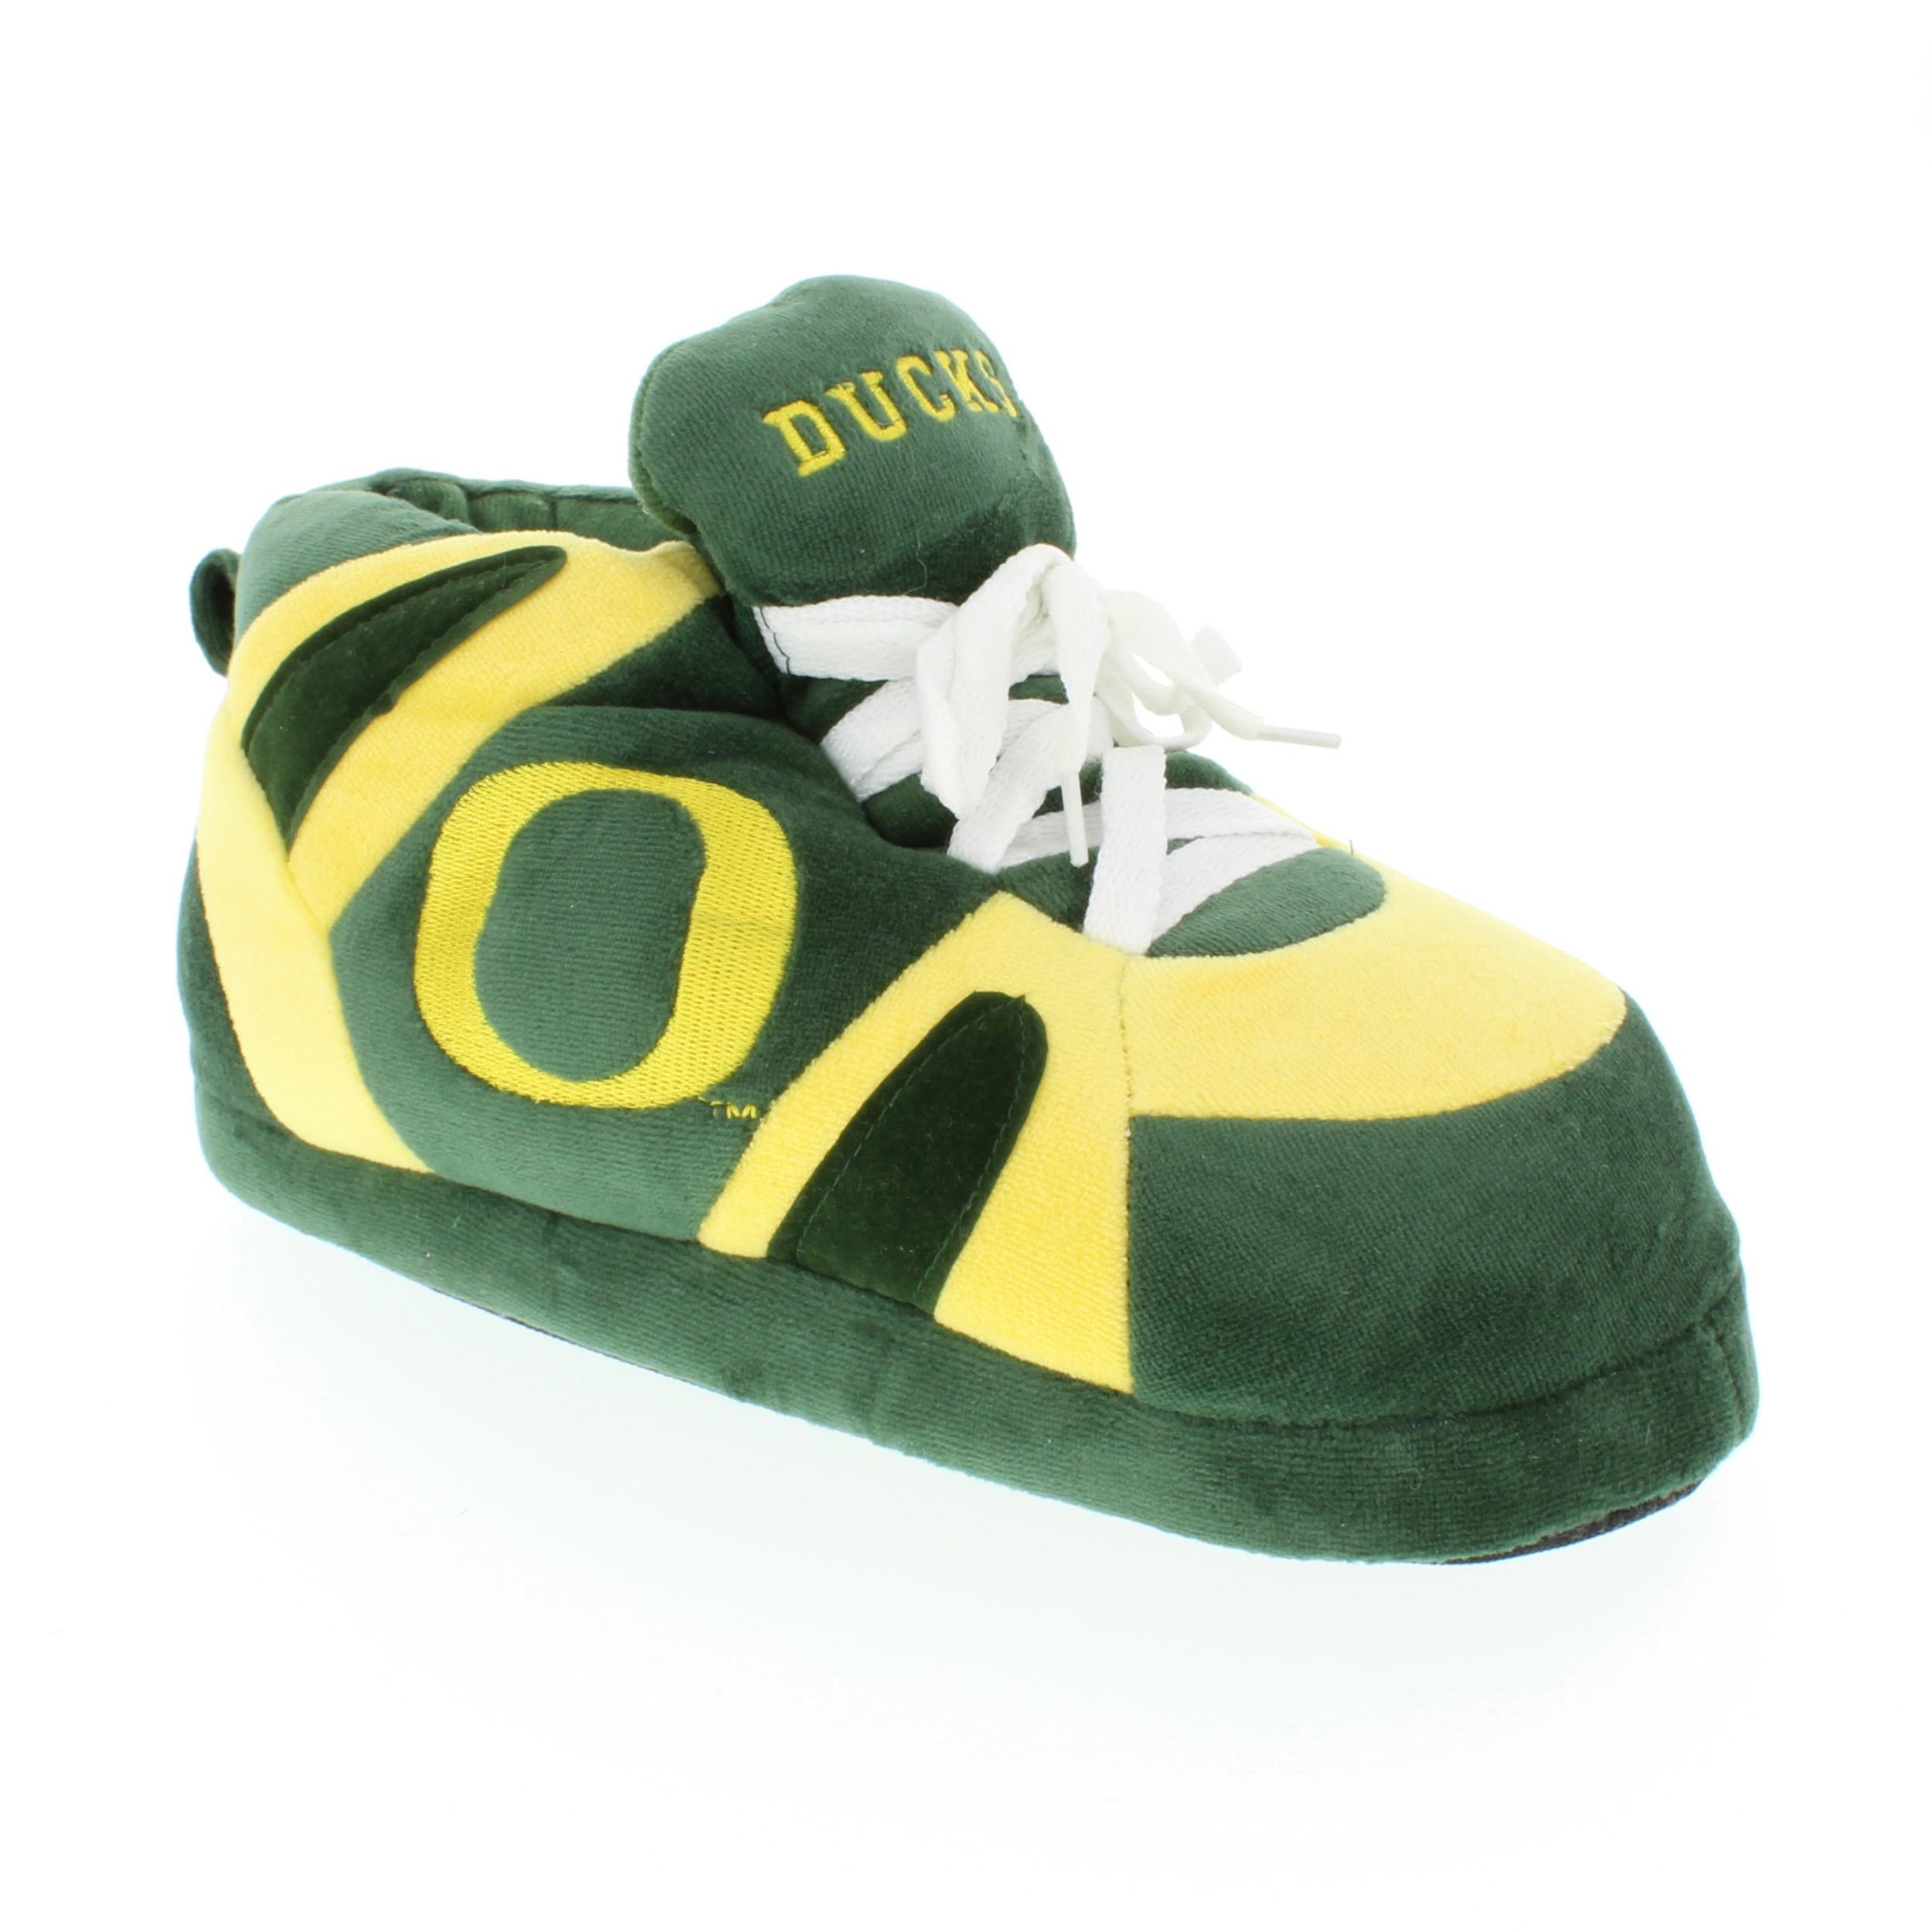 Comfy Feet Oregon Ducks Unisex Sneaker Slippers (Small - ...